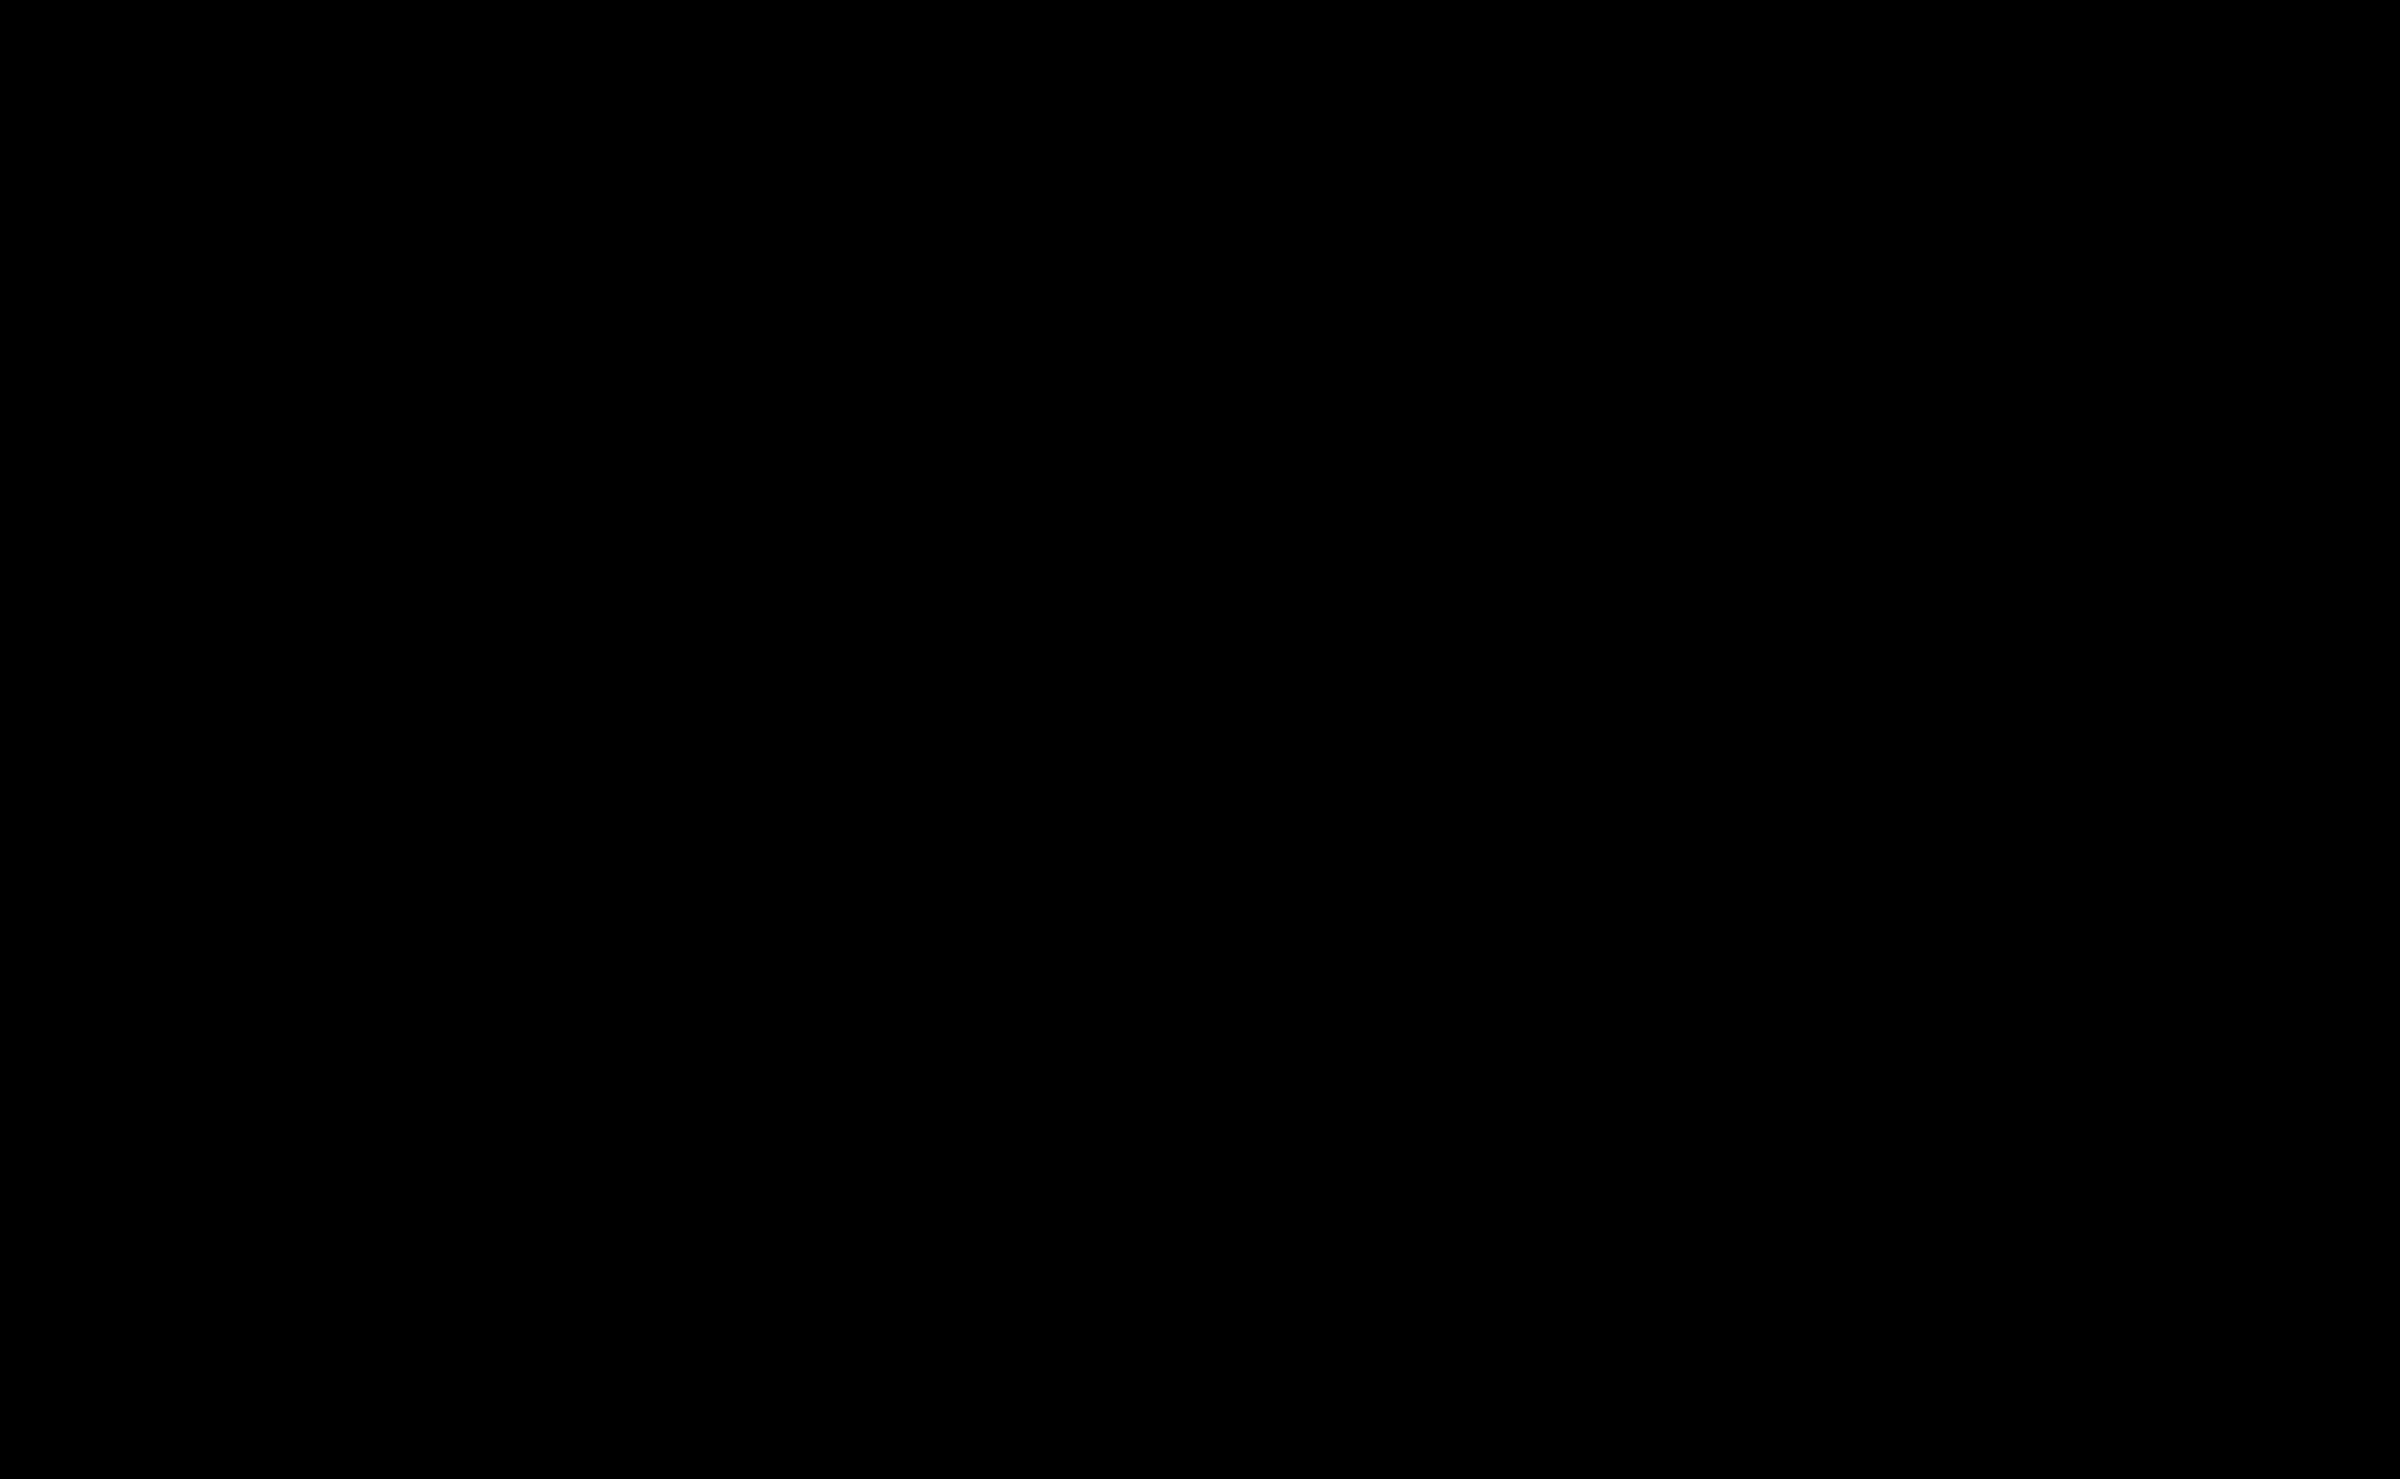 pfizer logo png transparent svg vector freebie supply rh freebiesupply com pfizer logo hd pfizer logo png